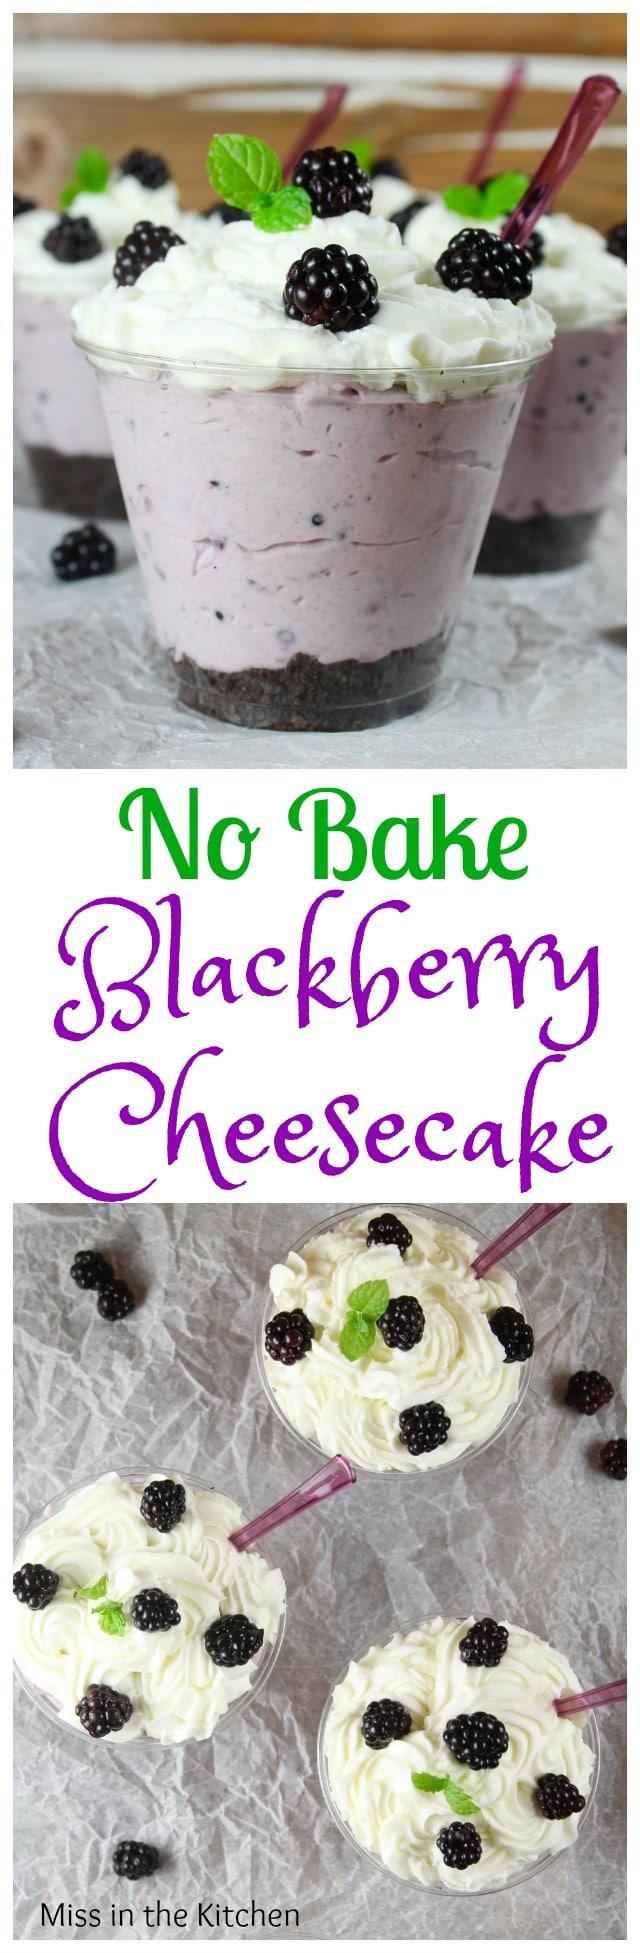 No Bake Blackberry Cheesecake Recipe the perfect summer dessert! From MissintheKitchen.com